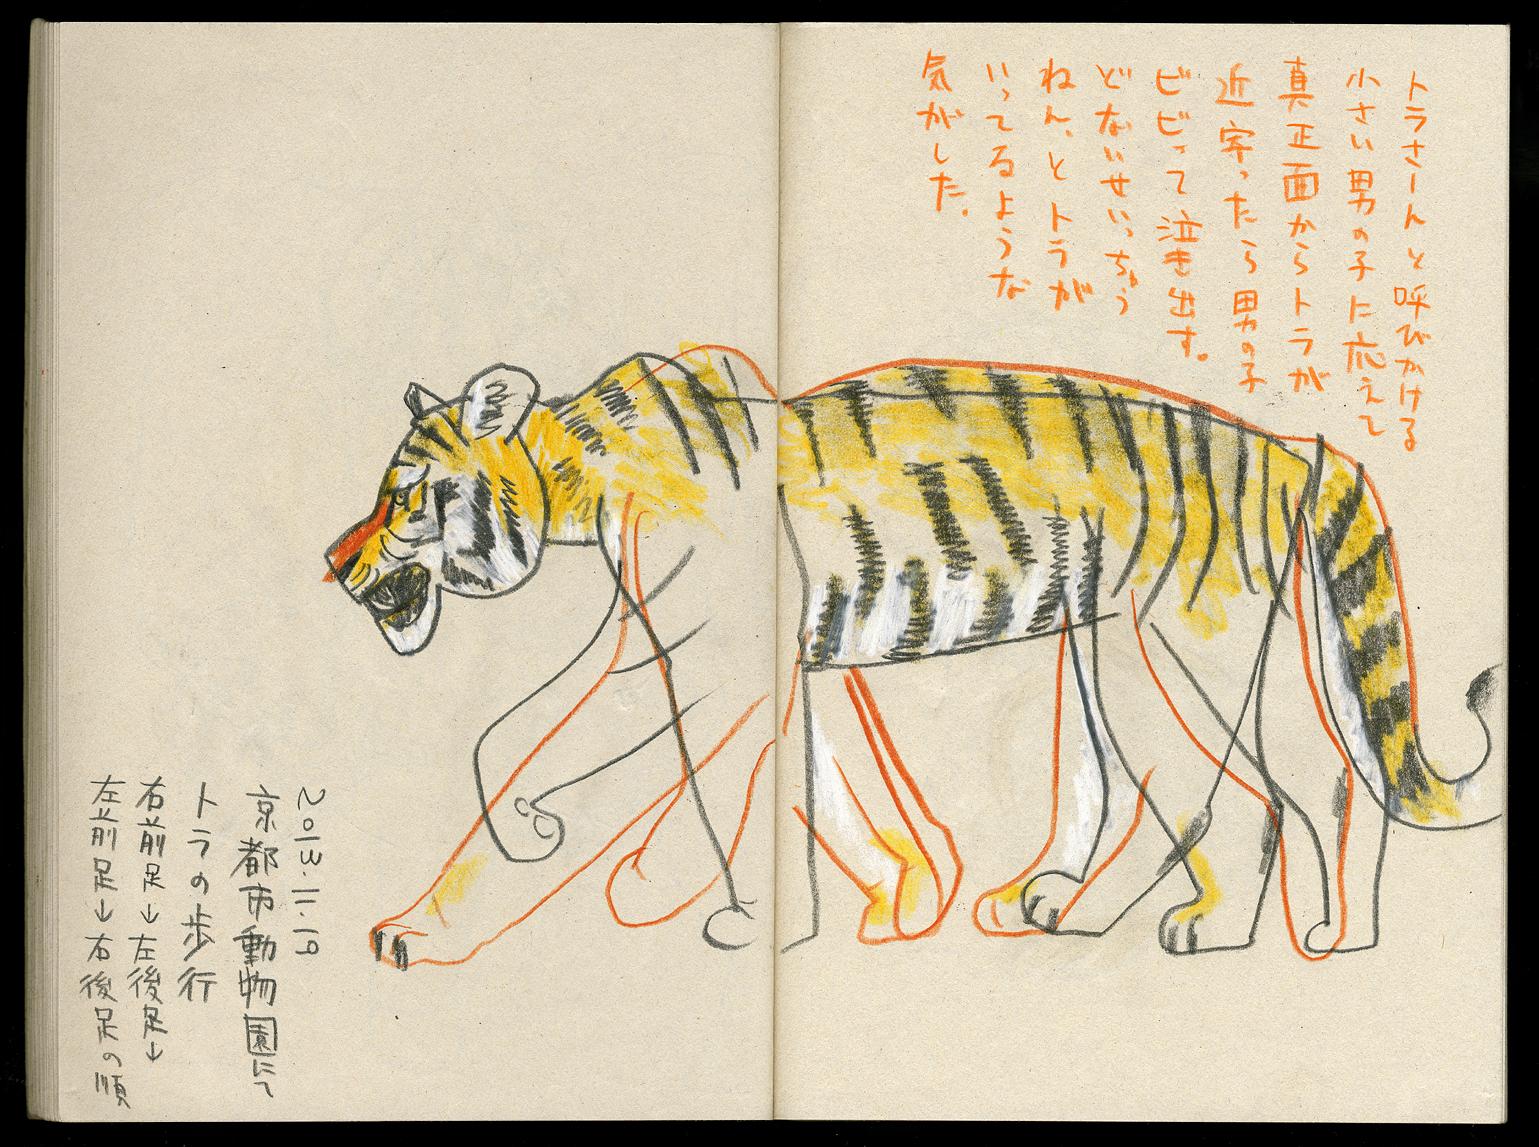 Wallpaper Ilustrasi Harimau Gambar Kartun Kebun Binatang Seni